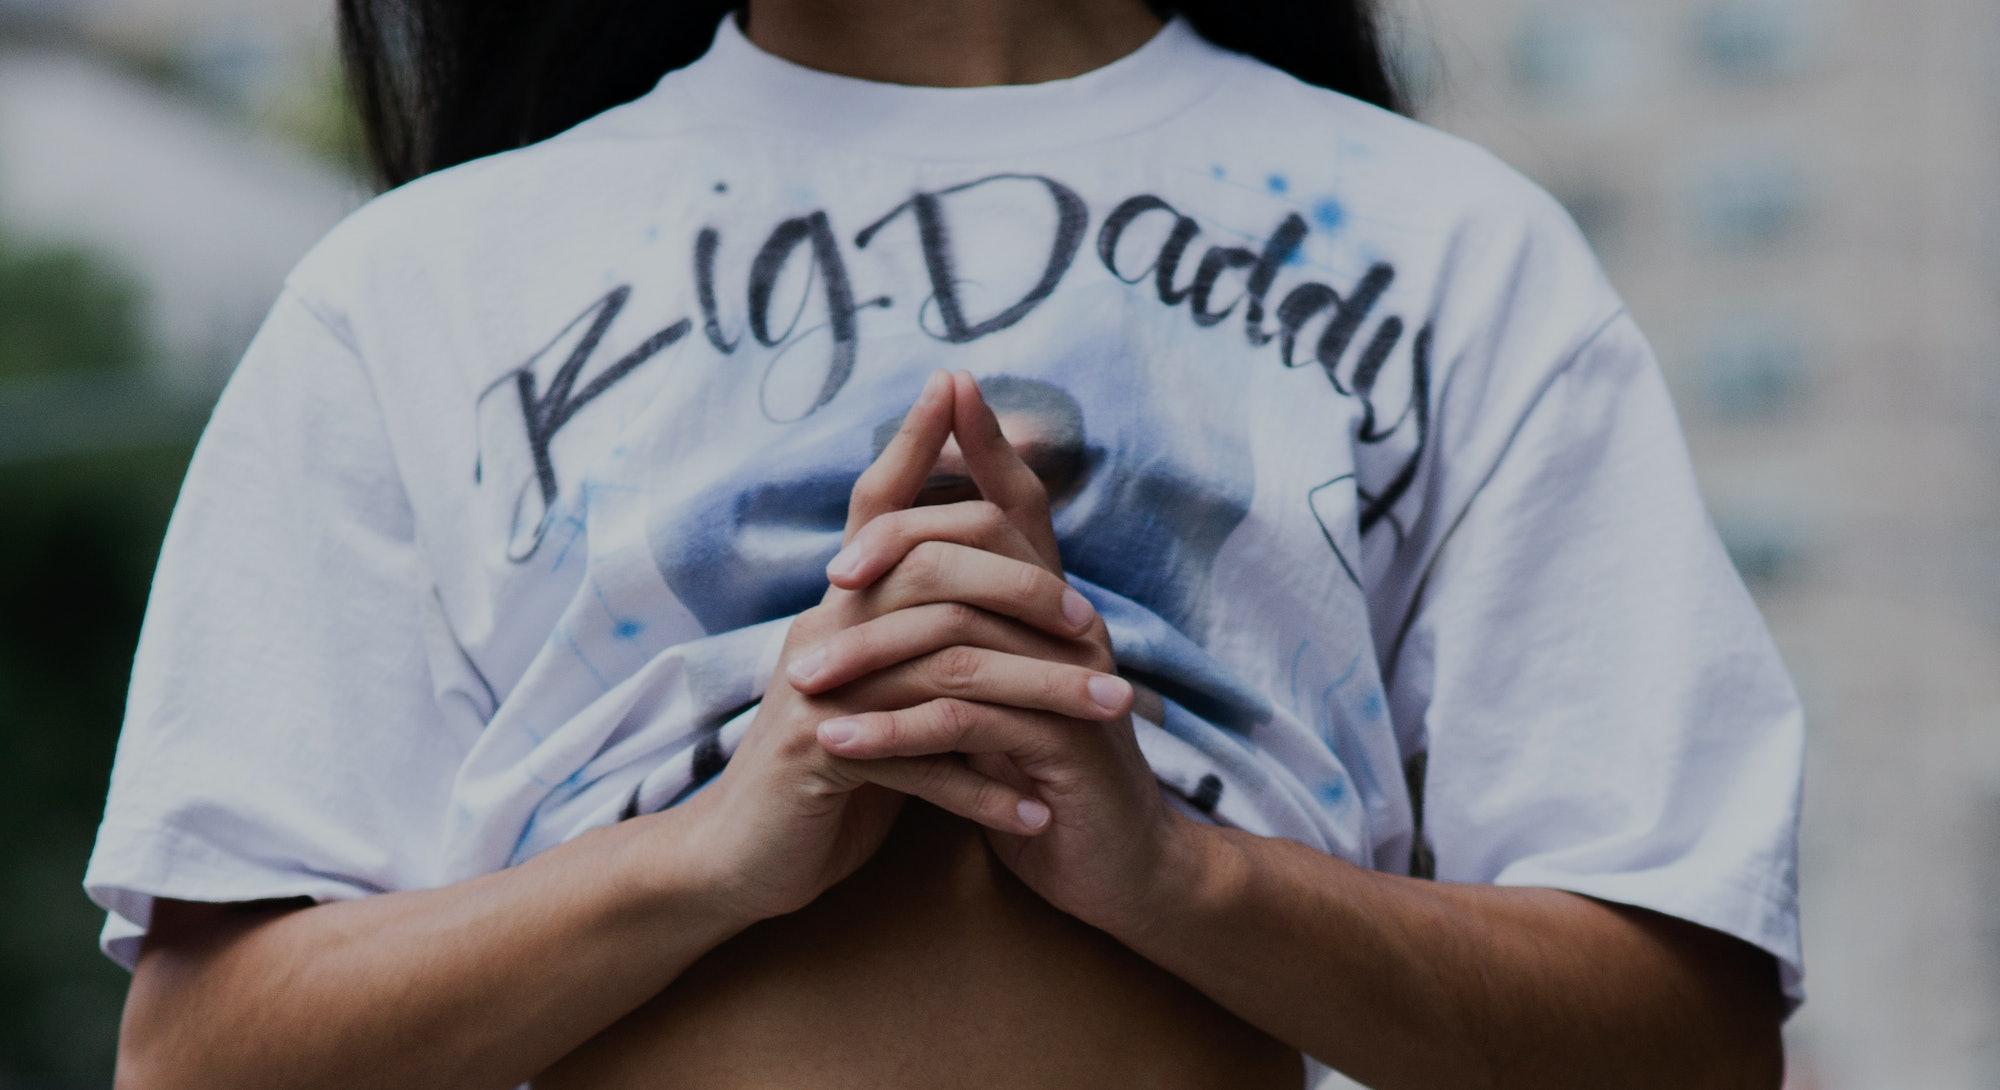 NEW YORK, NEW YORK - SEPTEMBER 09: Jeffrey Prada wearing white jeans with spray paint and white t-sh...